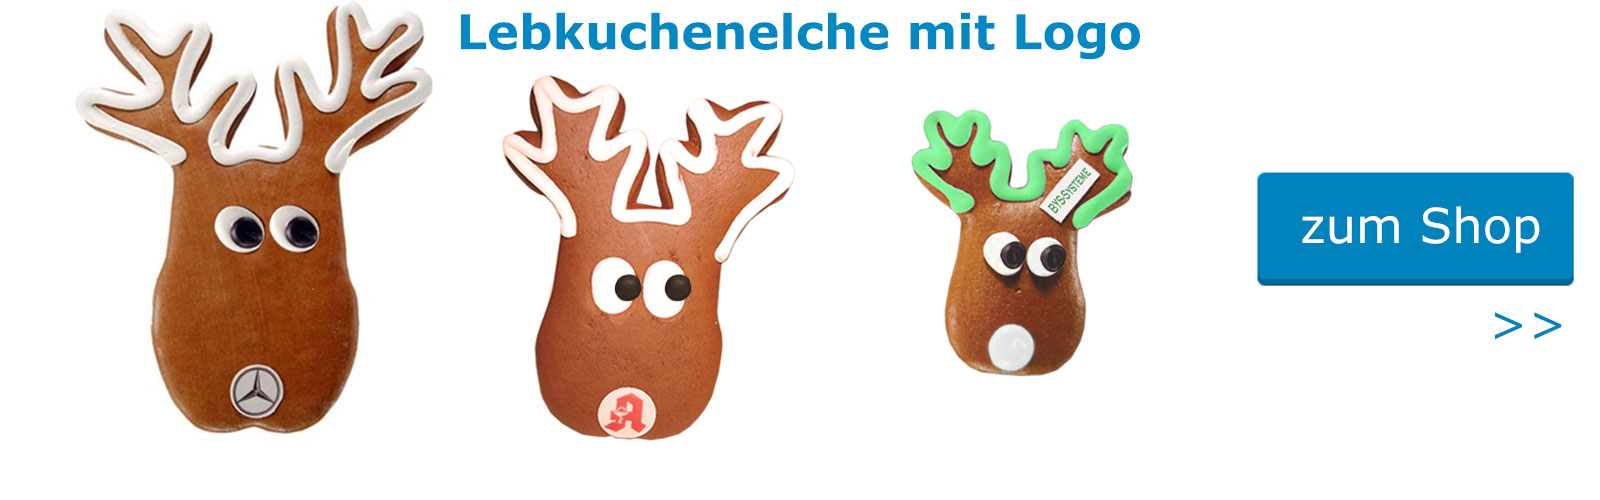 Lebkuchen Elchkopf Shop